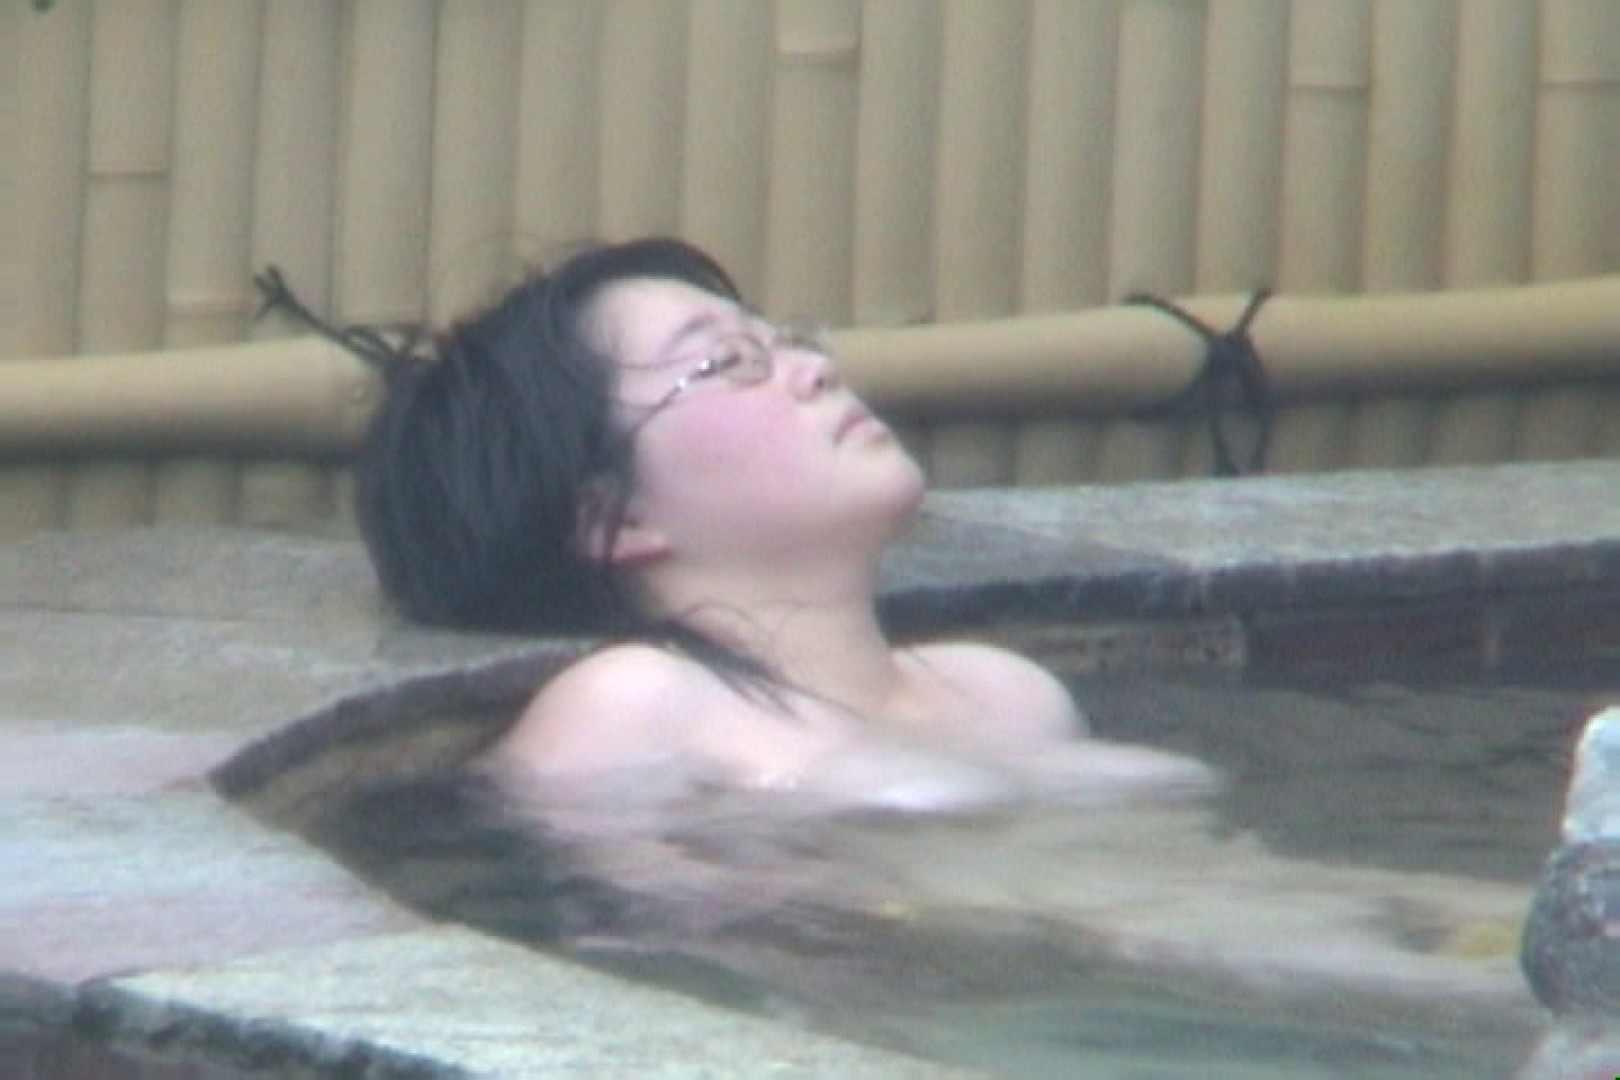 Aquaな露天風呂Vol.46【VIP限定】 HなOL | 露天  90pic 11